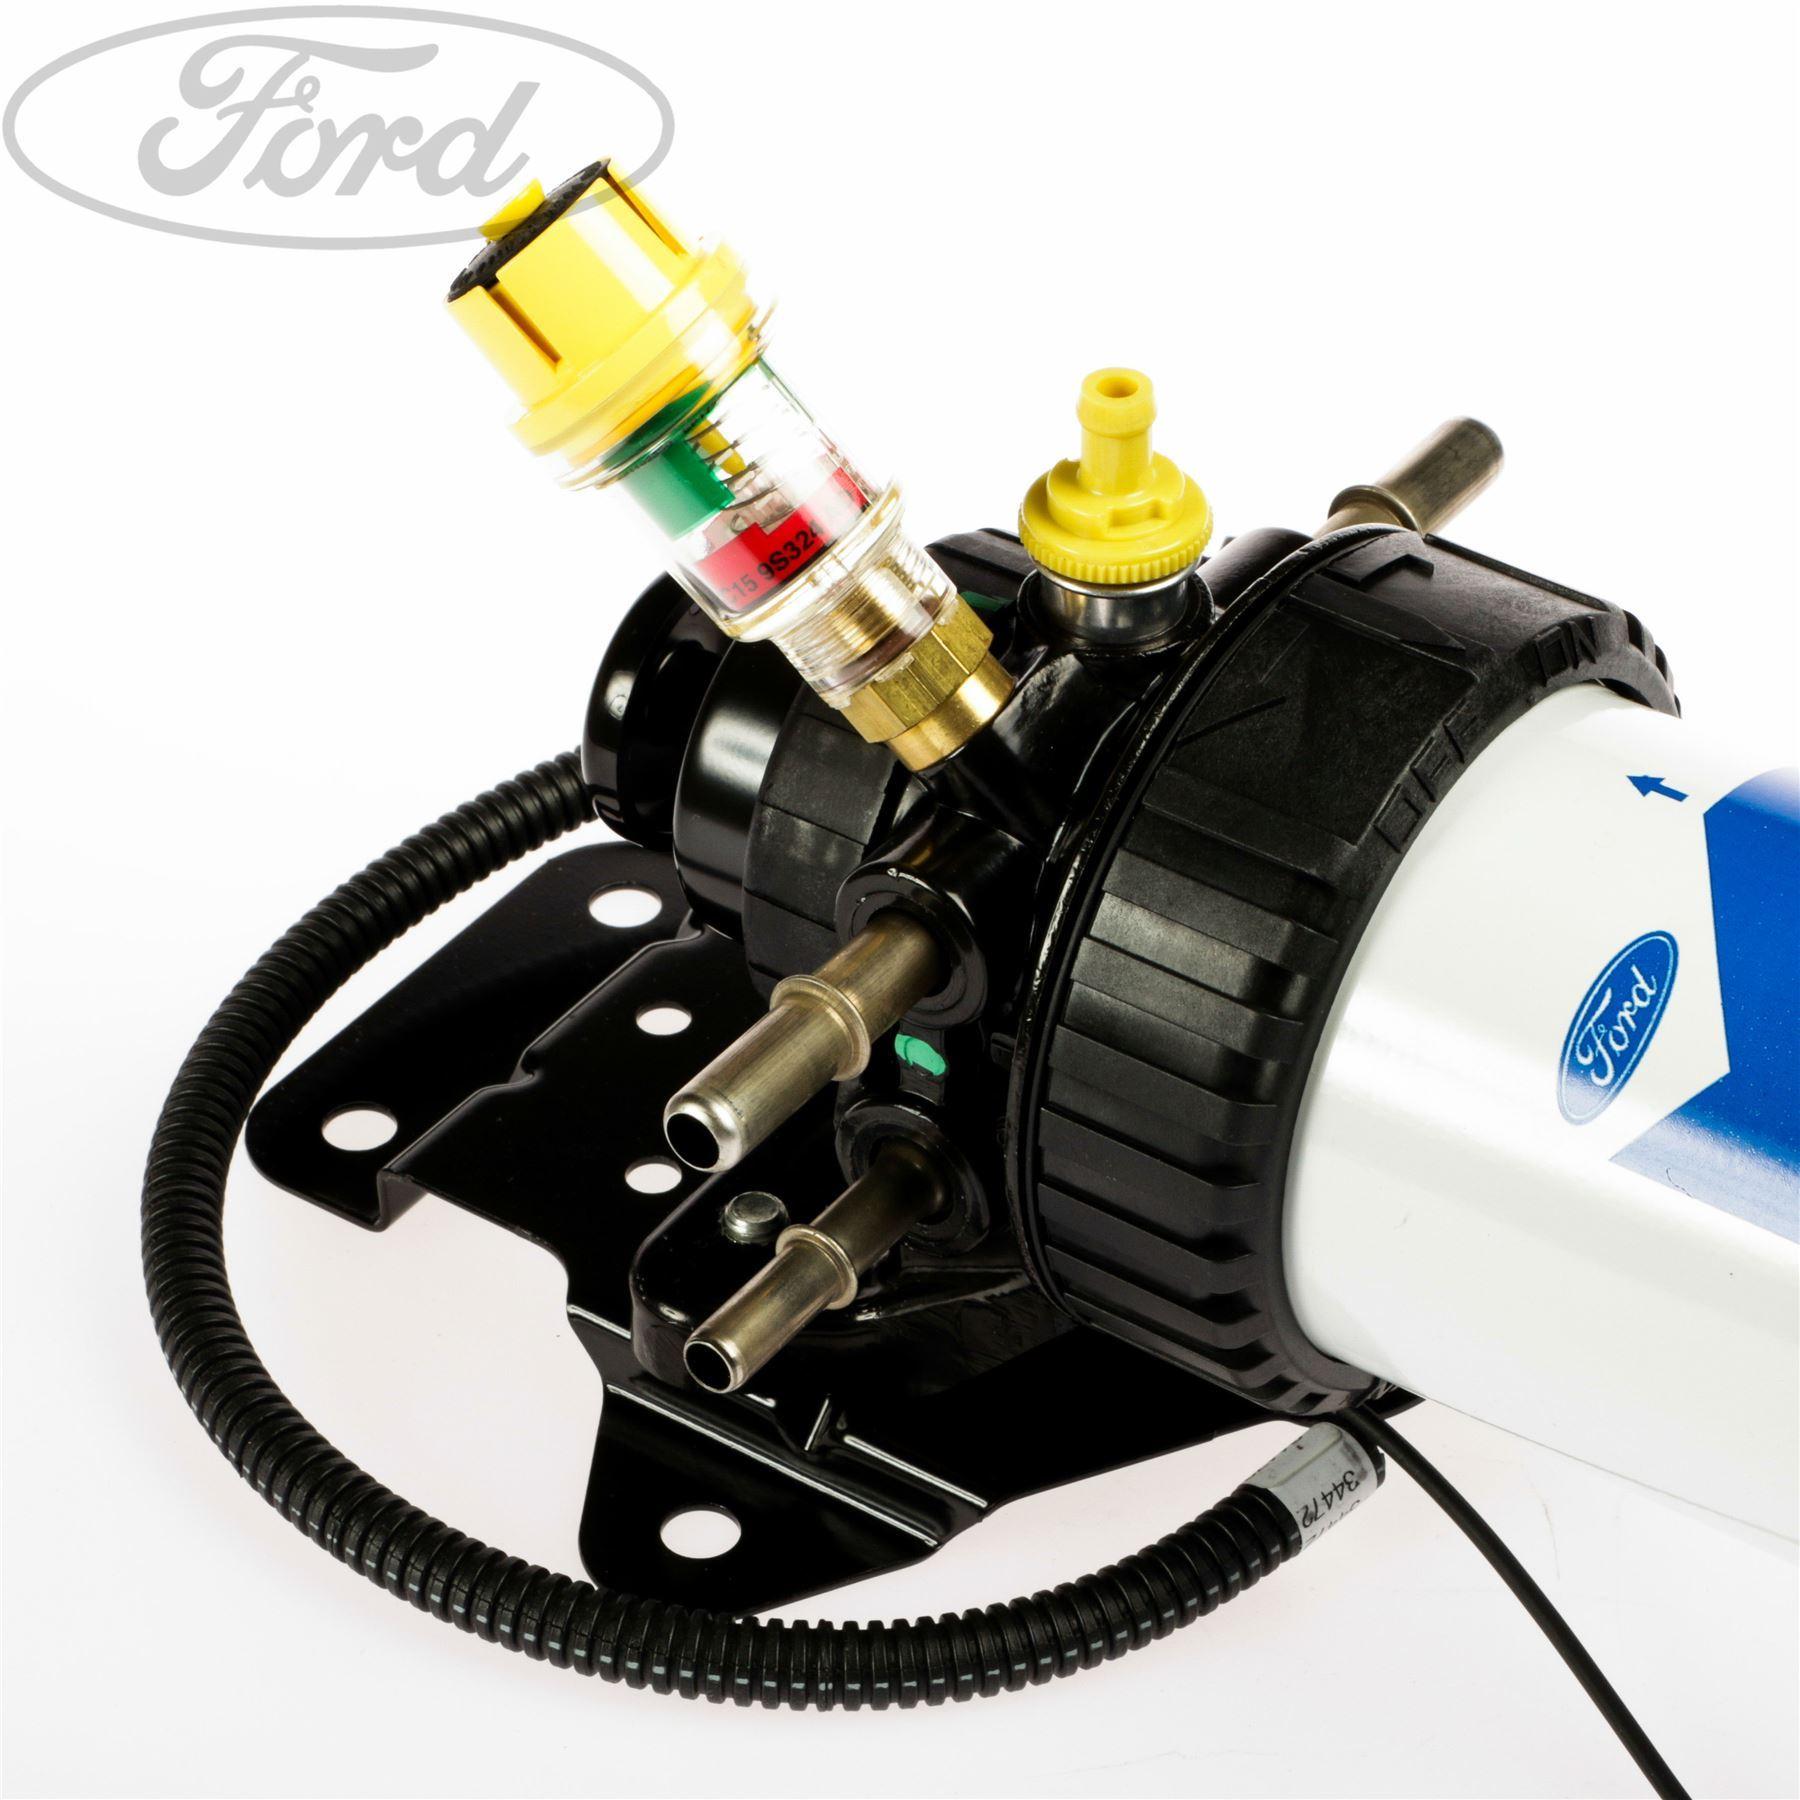 Genuine Ford Transit Mk6 20 24 Tdci Diesel Fuel Filter Inc Hand F250 Location Pump 1725625